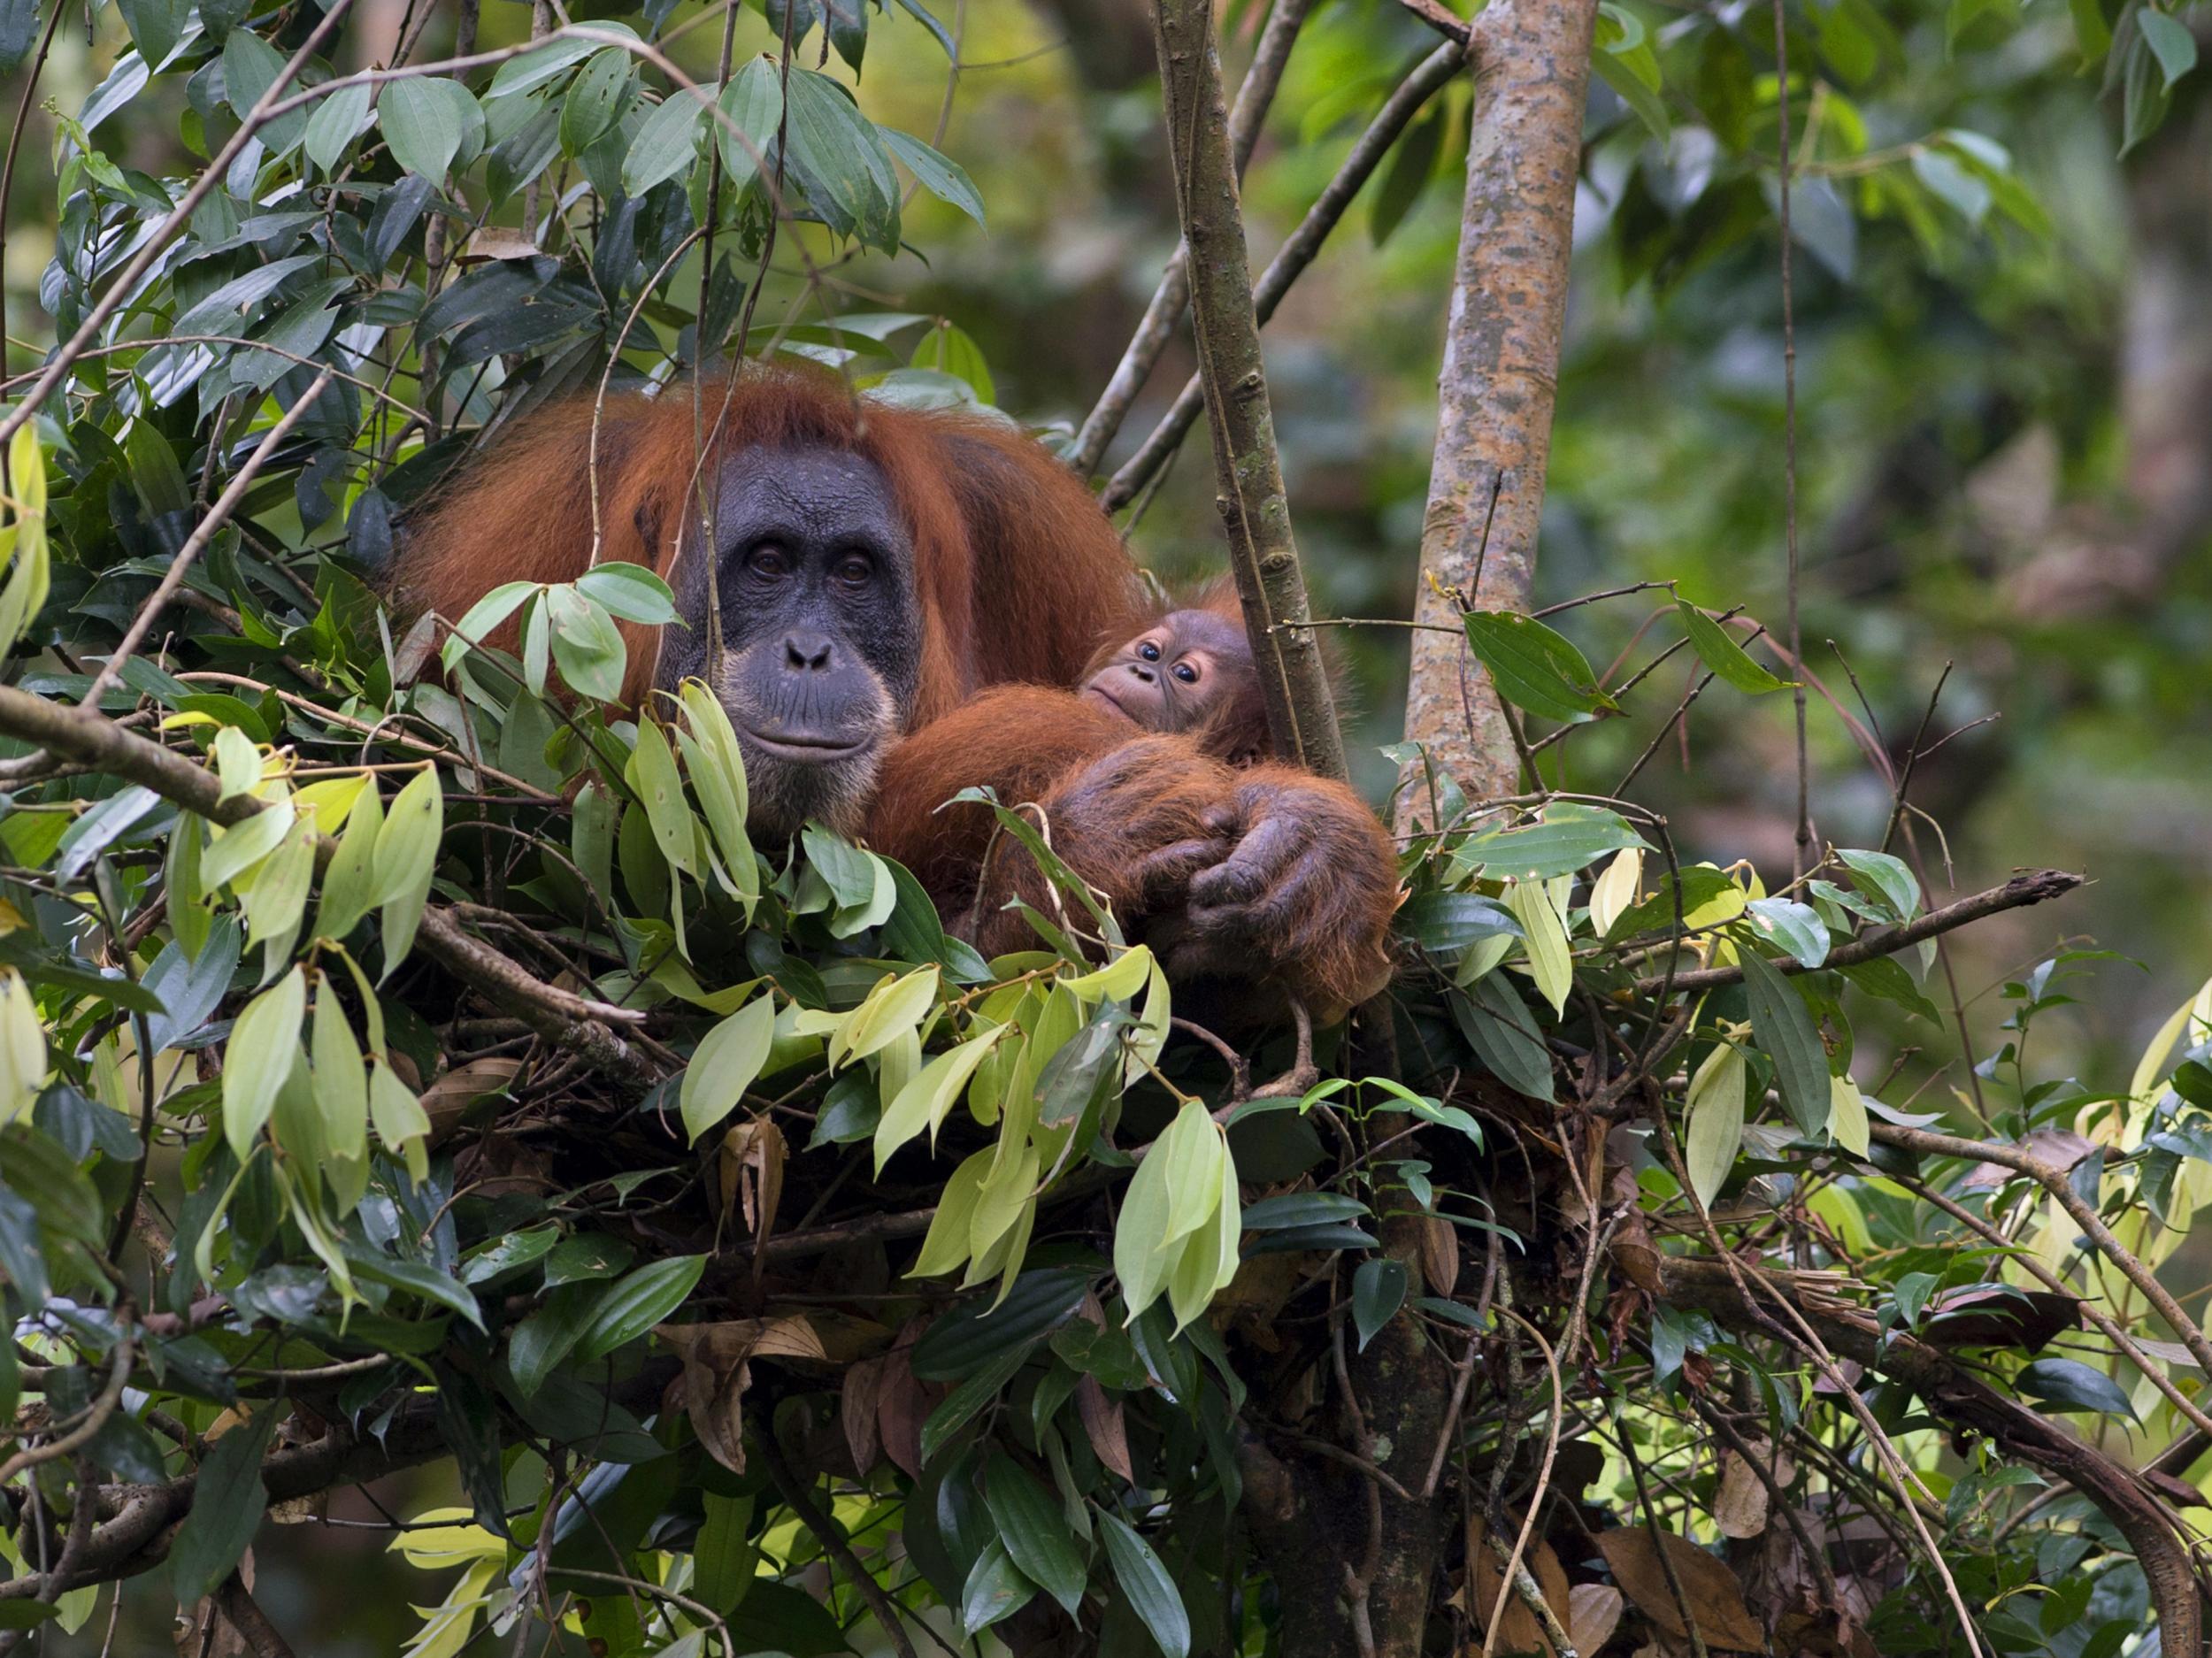 Norway to heavily restrict palm oils linked to devastating deforestation